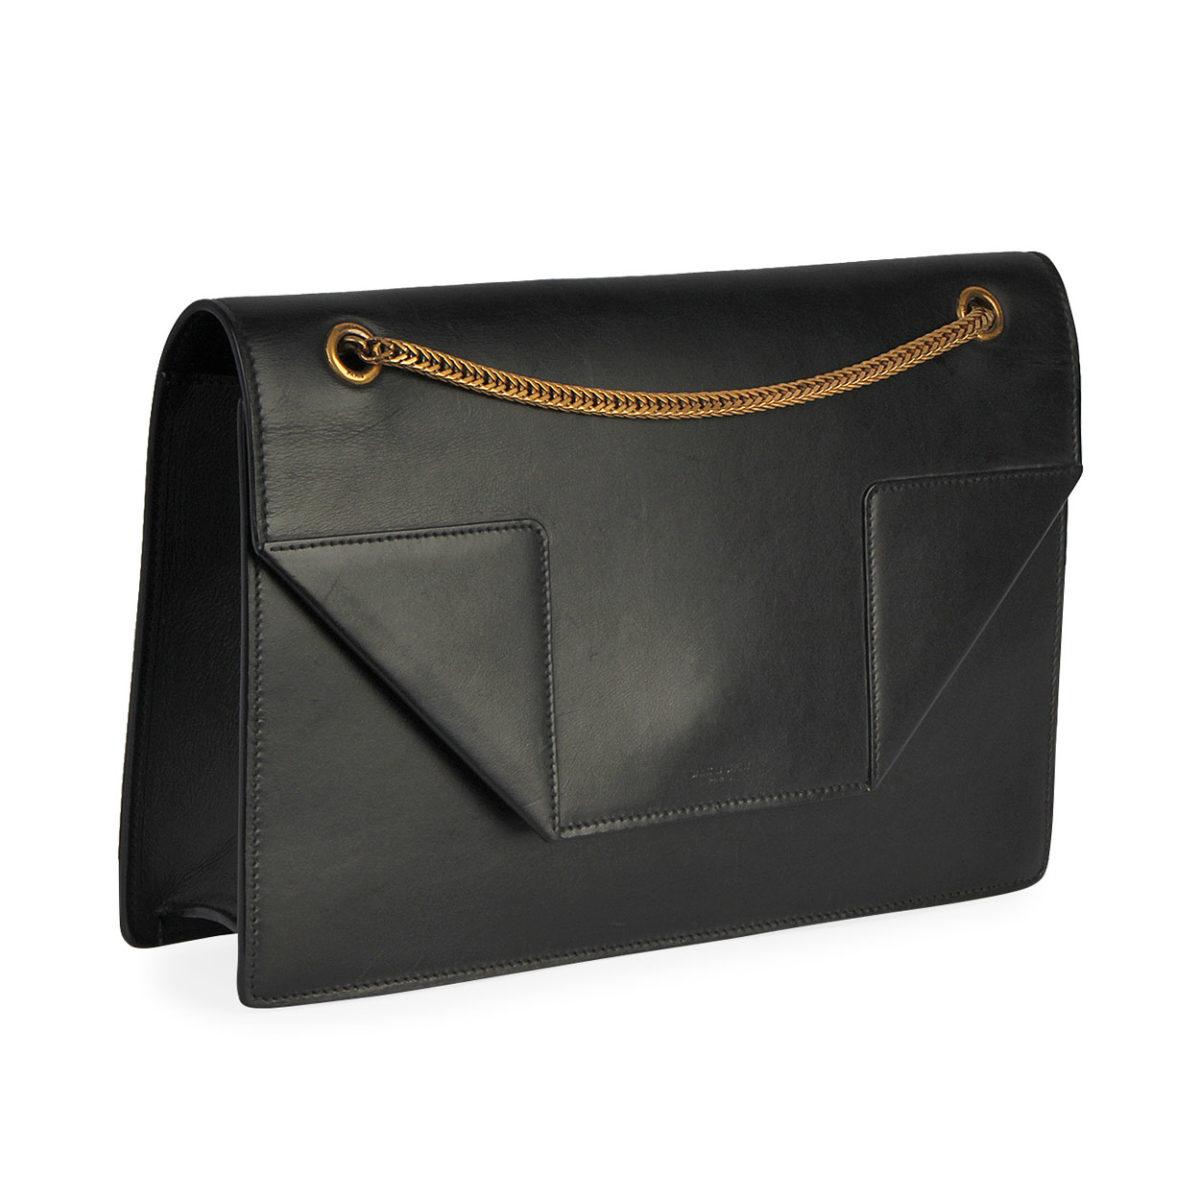 yves saint laurent leather sac betty shoulder bag black luxity